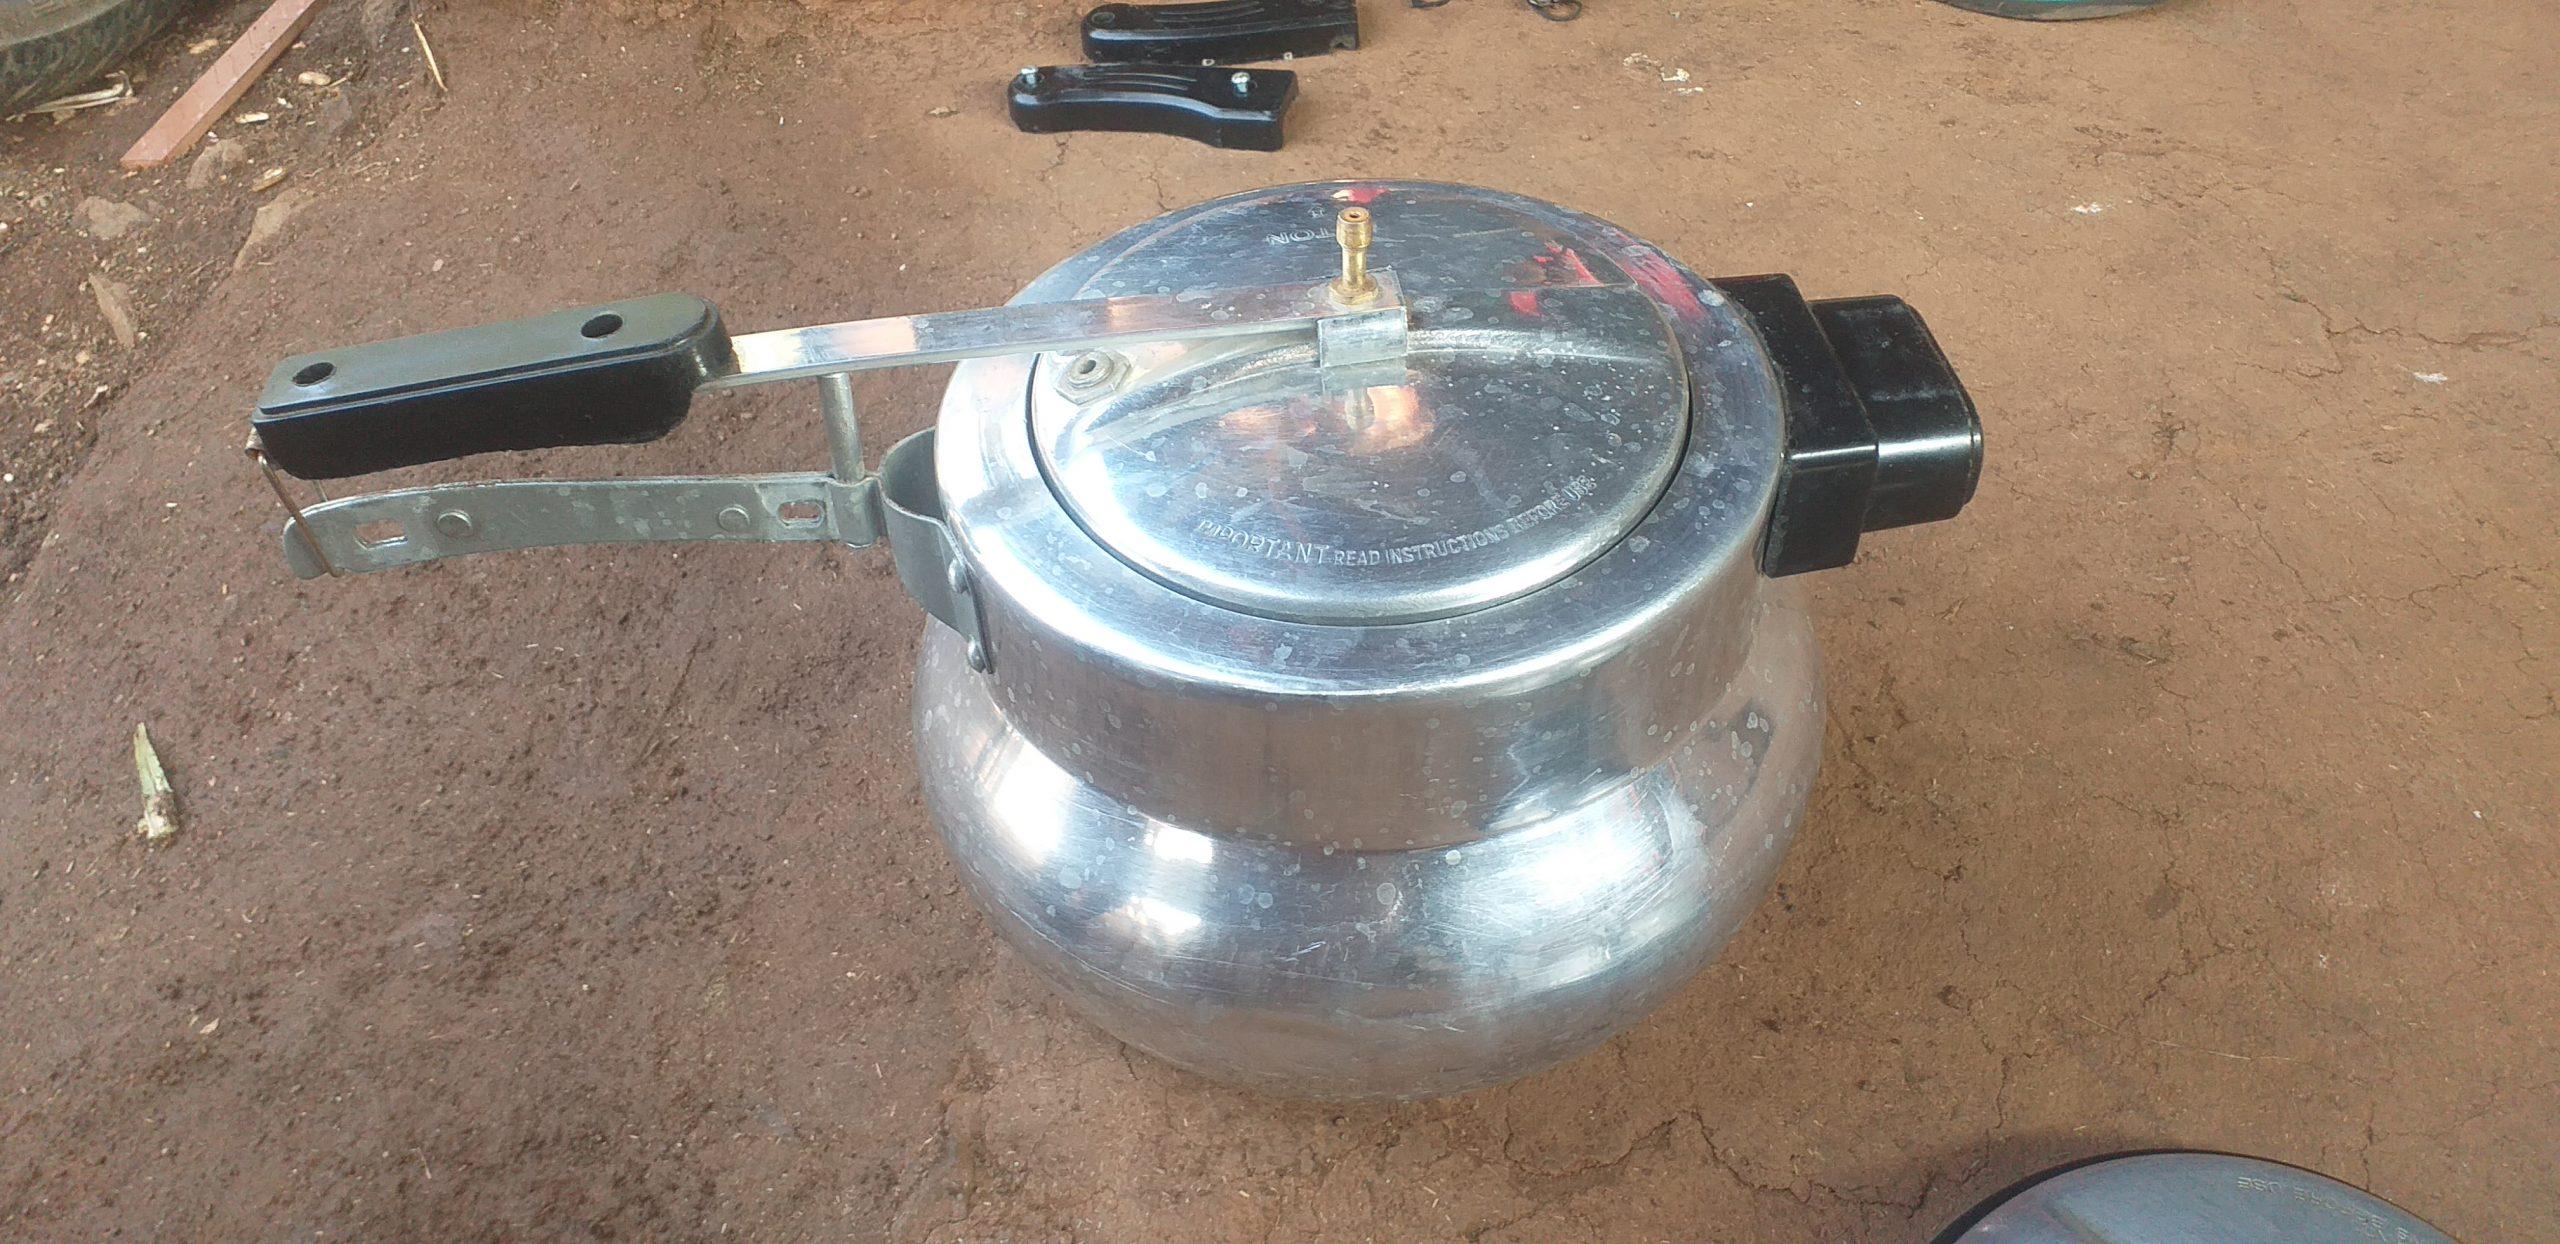 A pressure cooker